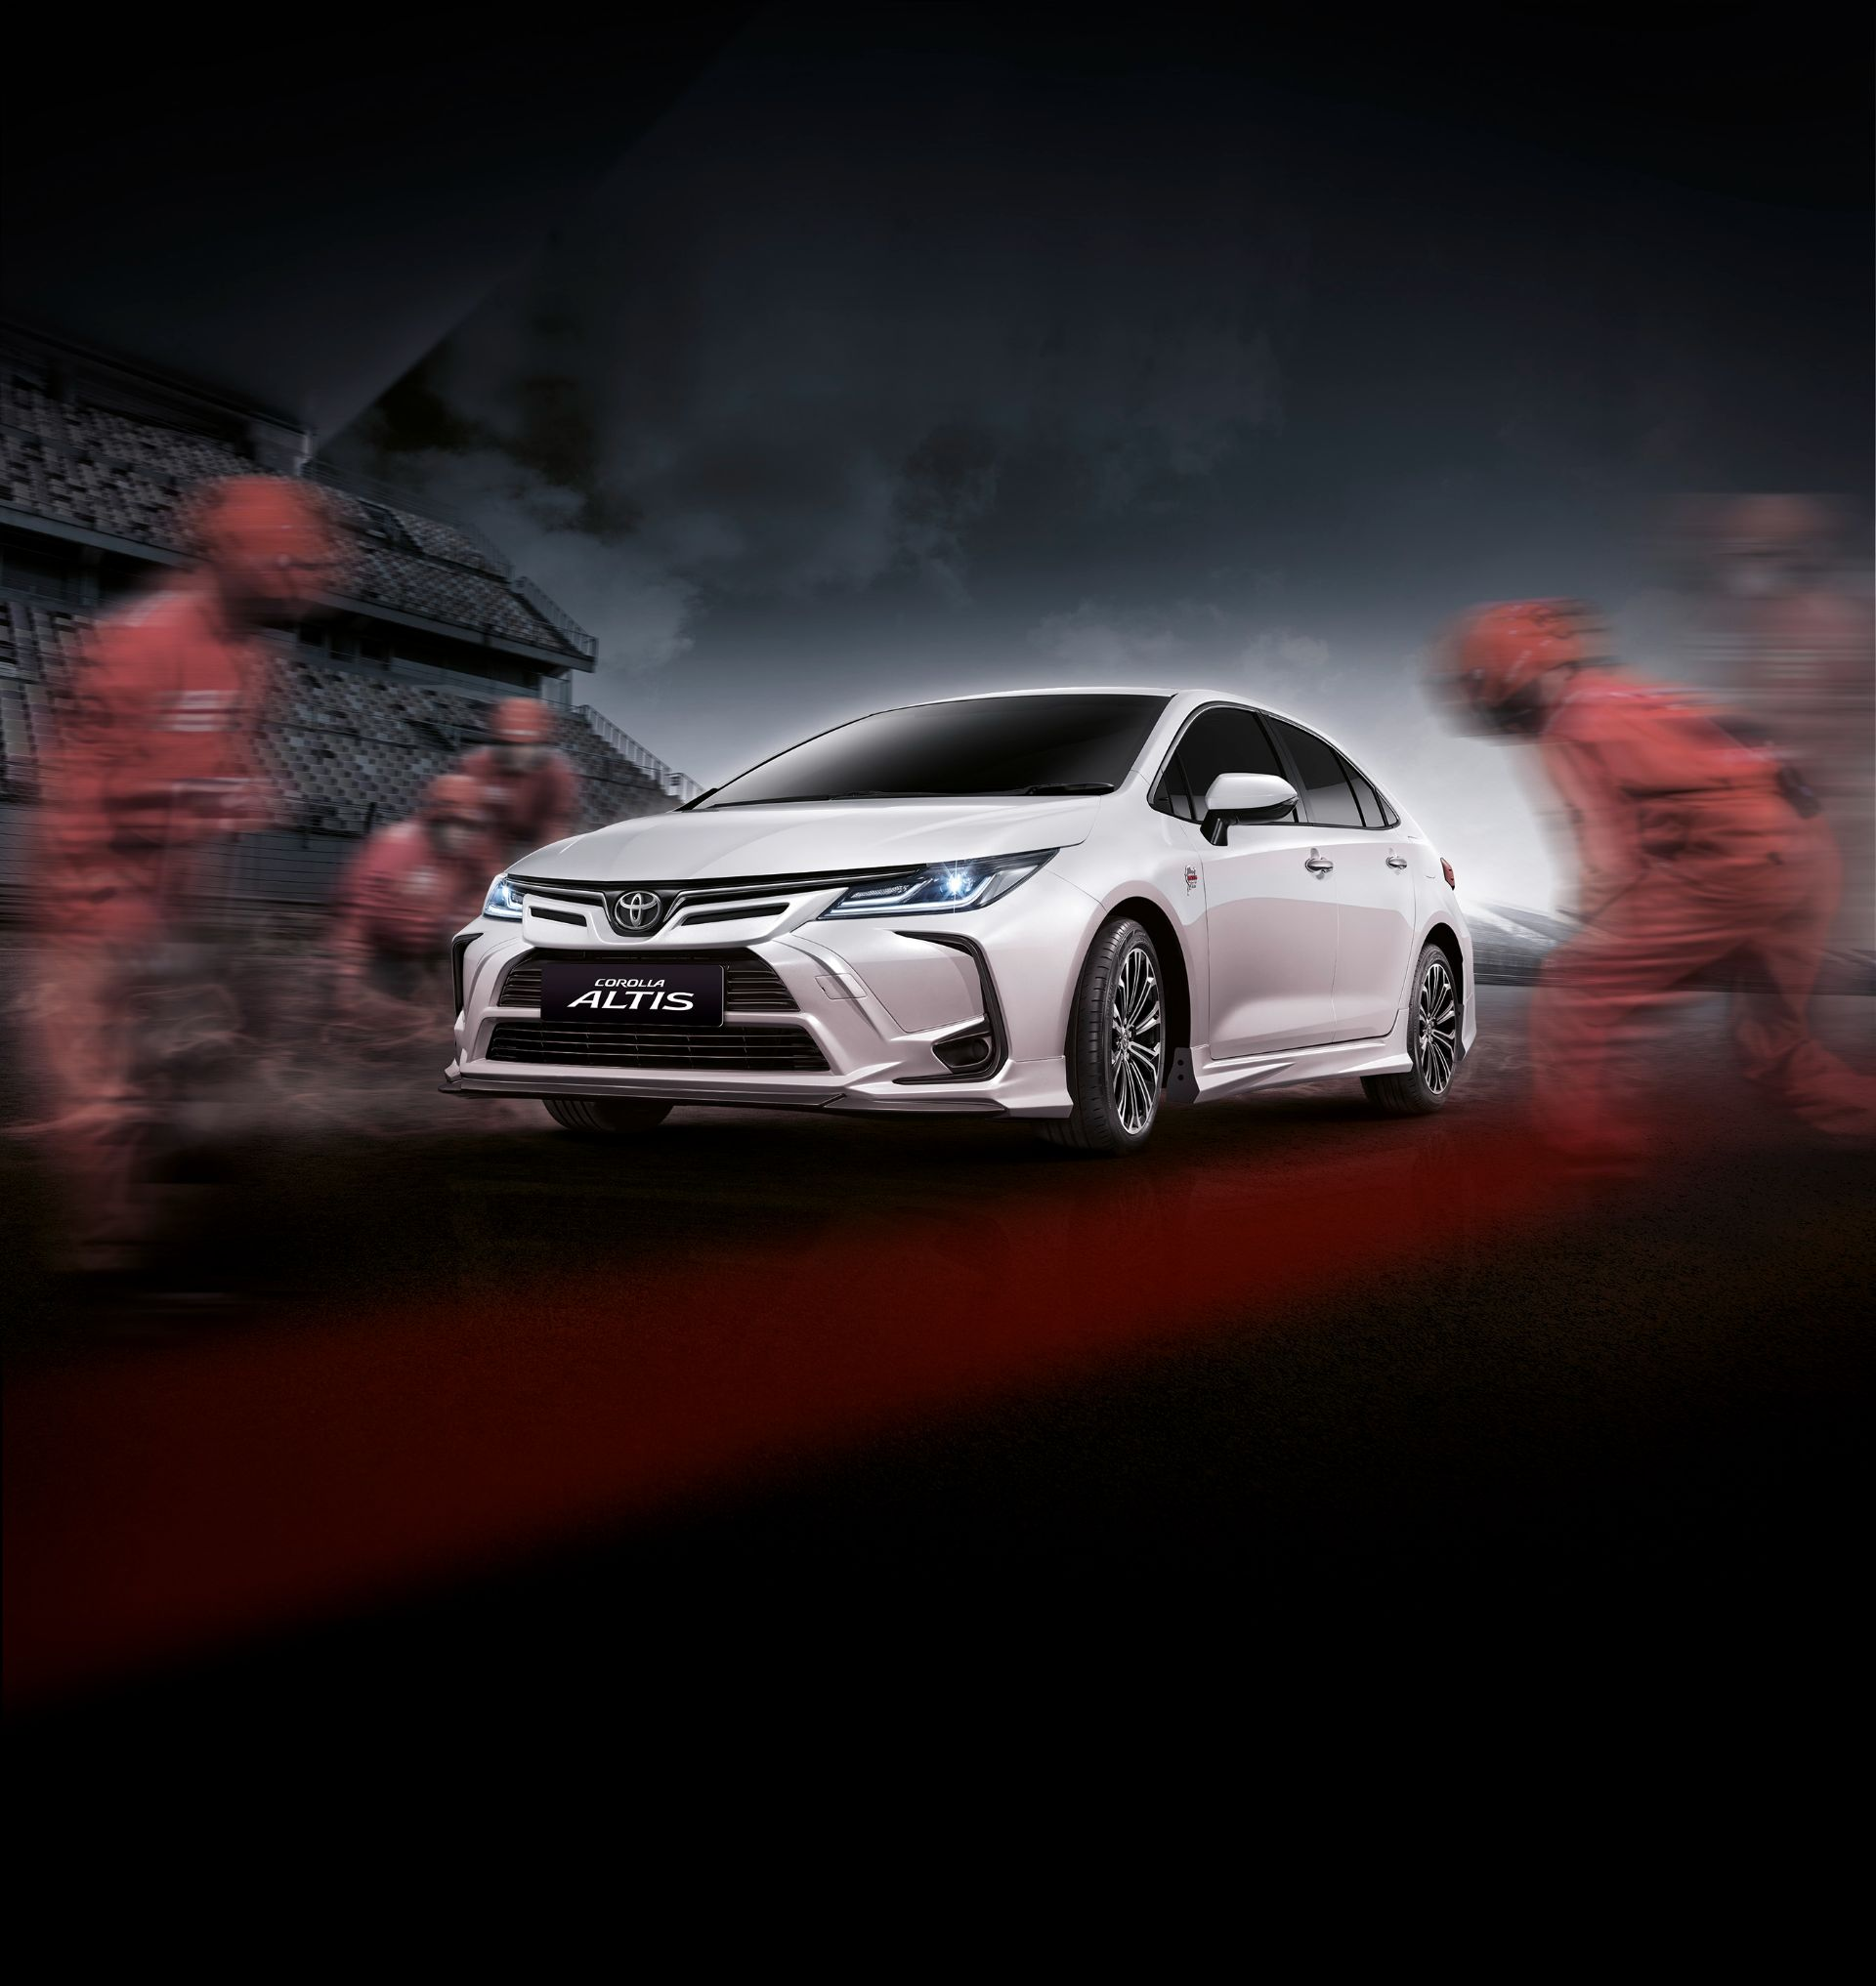 Toyota-Corolla-Altis-Nurburgring-Edition-3